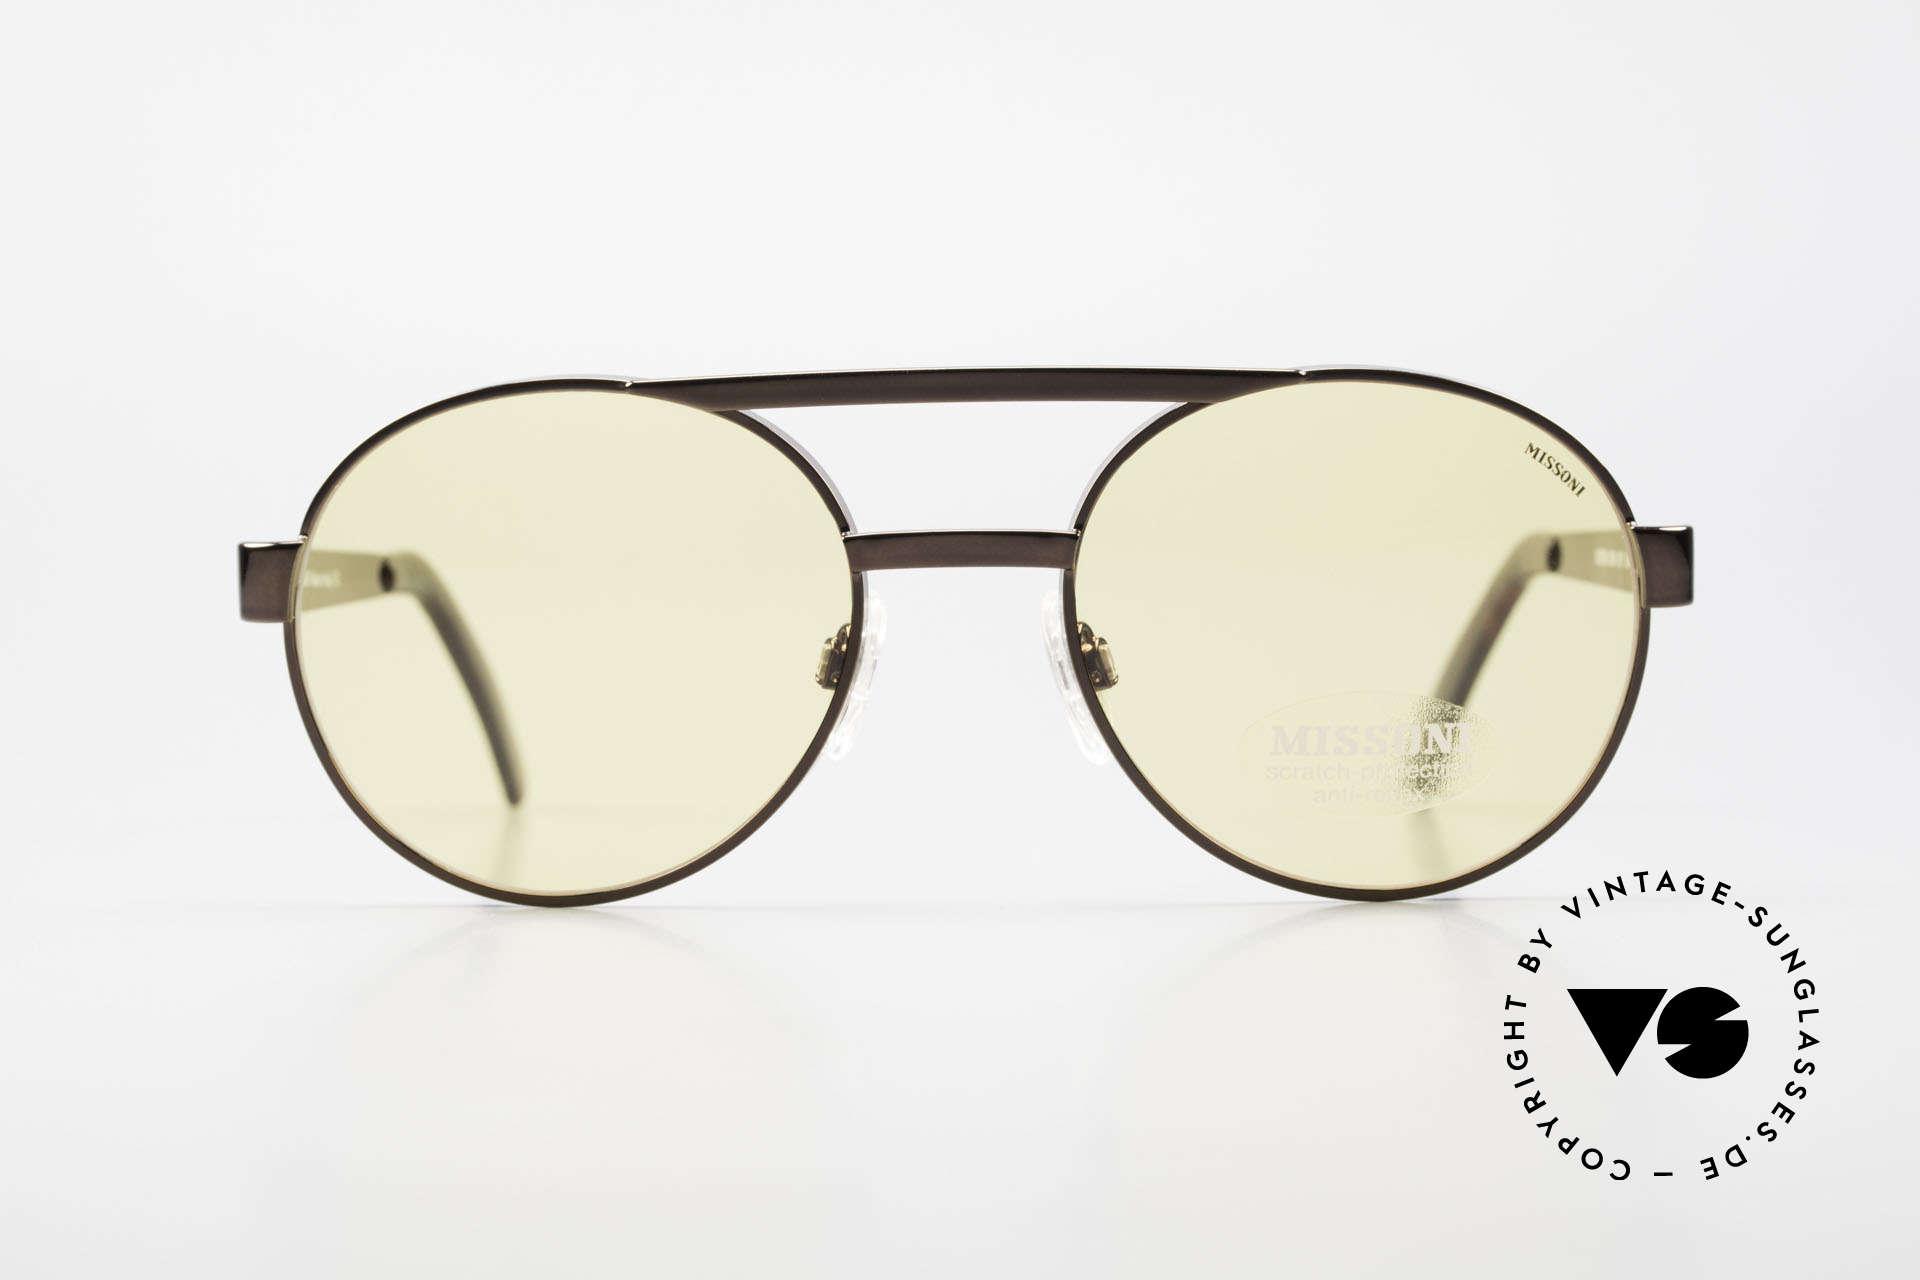 Missoni 0099 Round Panto 90's Sunglasses, extraordinary 1990's Panto Style men's sunglasses, Made for Men